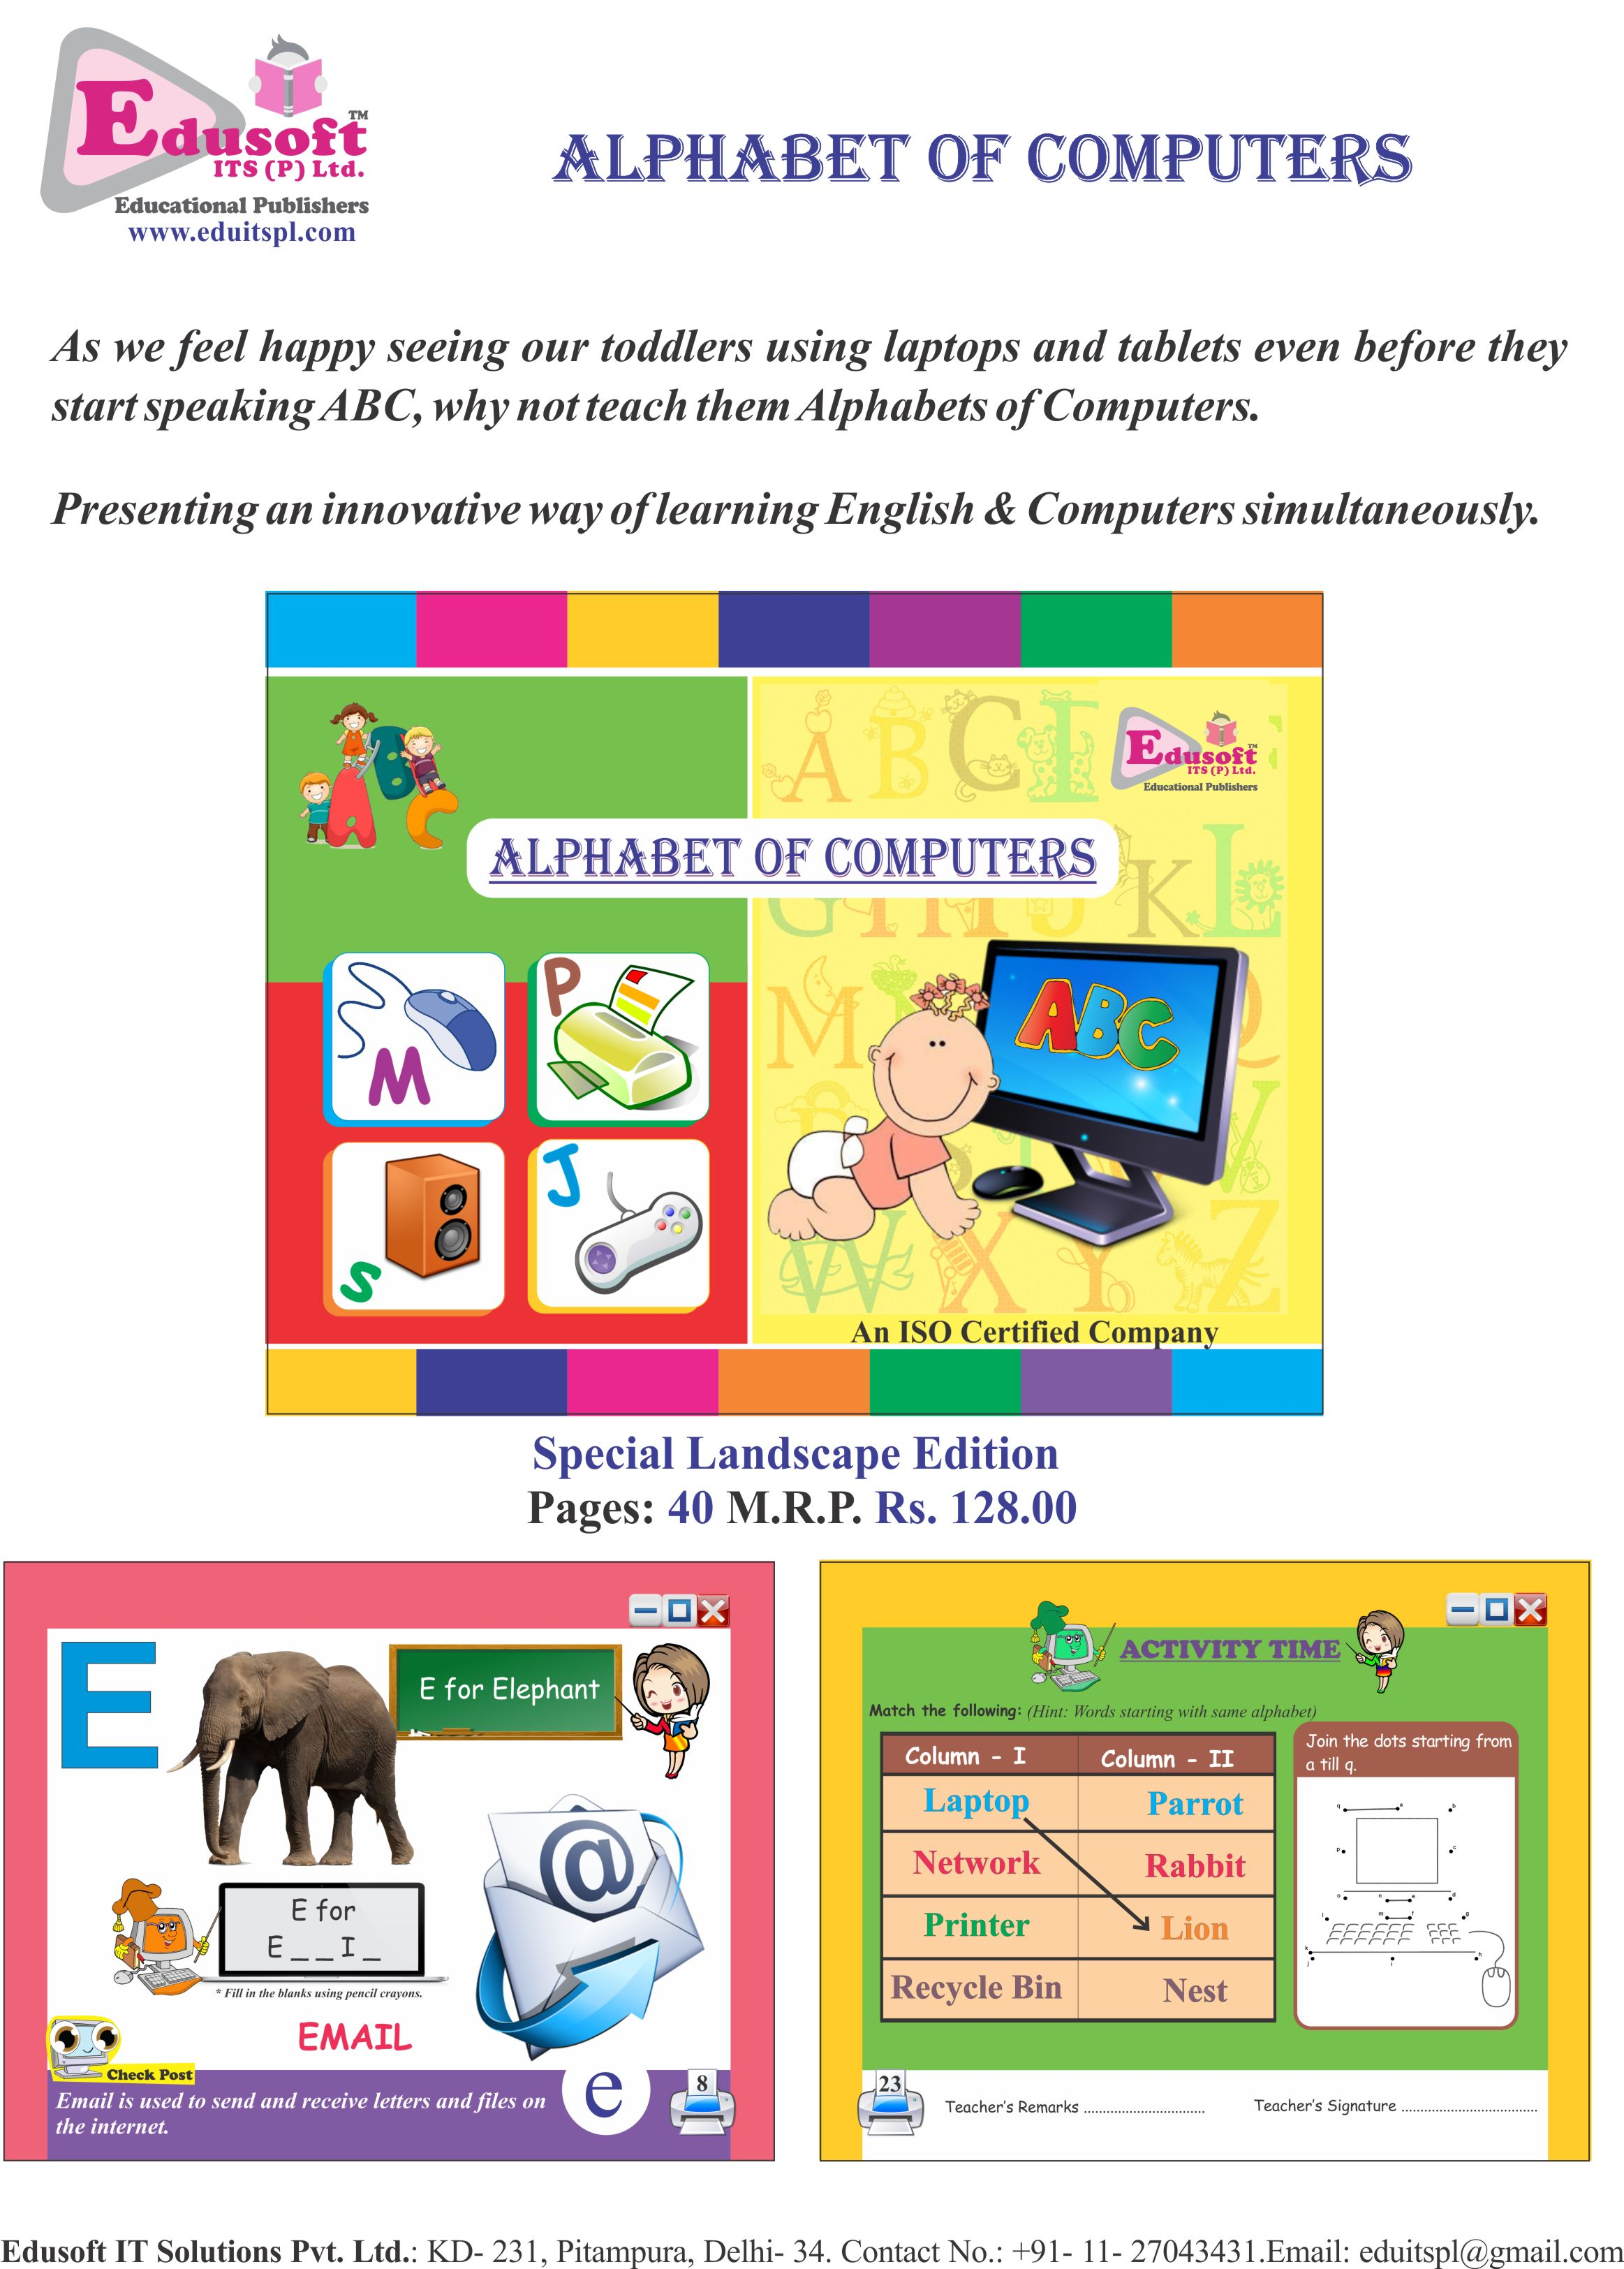 Alphabet of Computers 2017